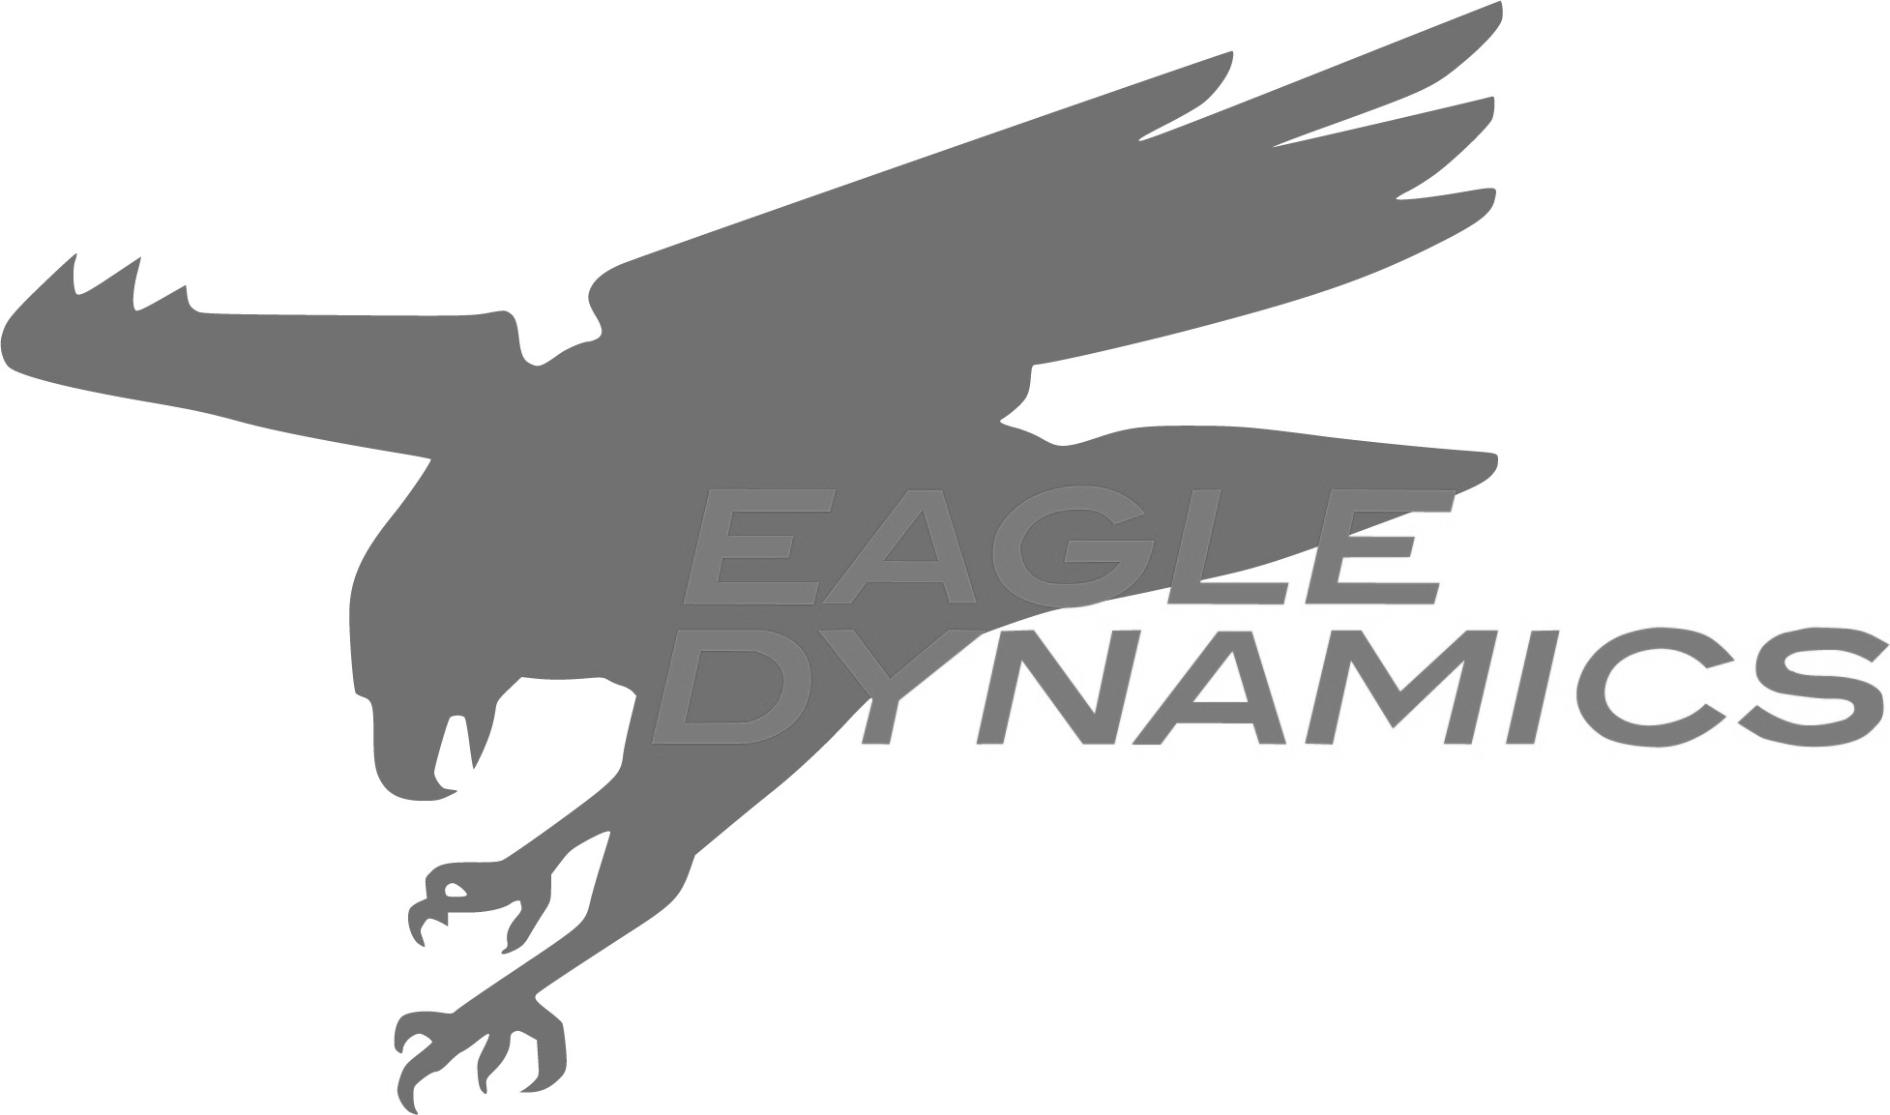 EAGLE DYNAMICS